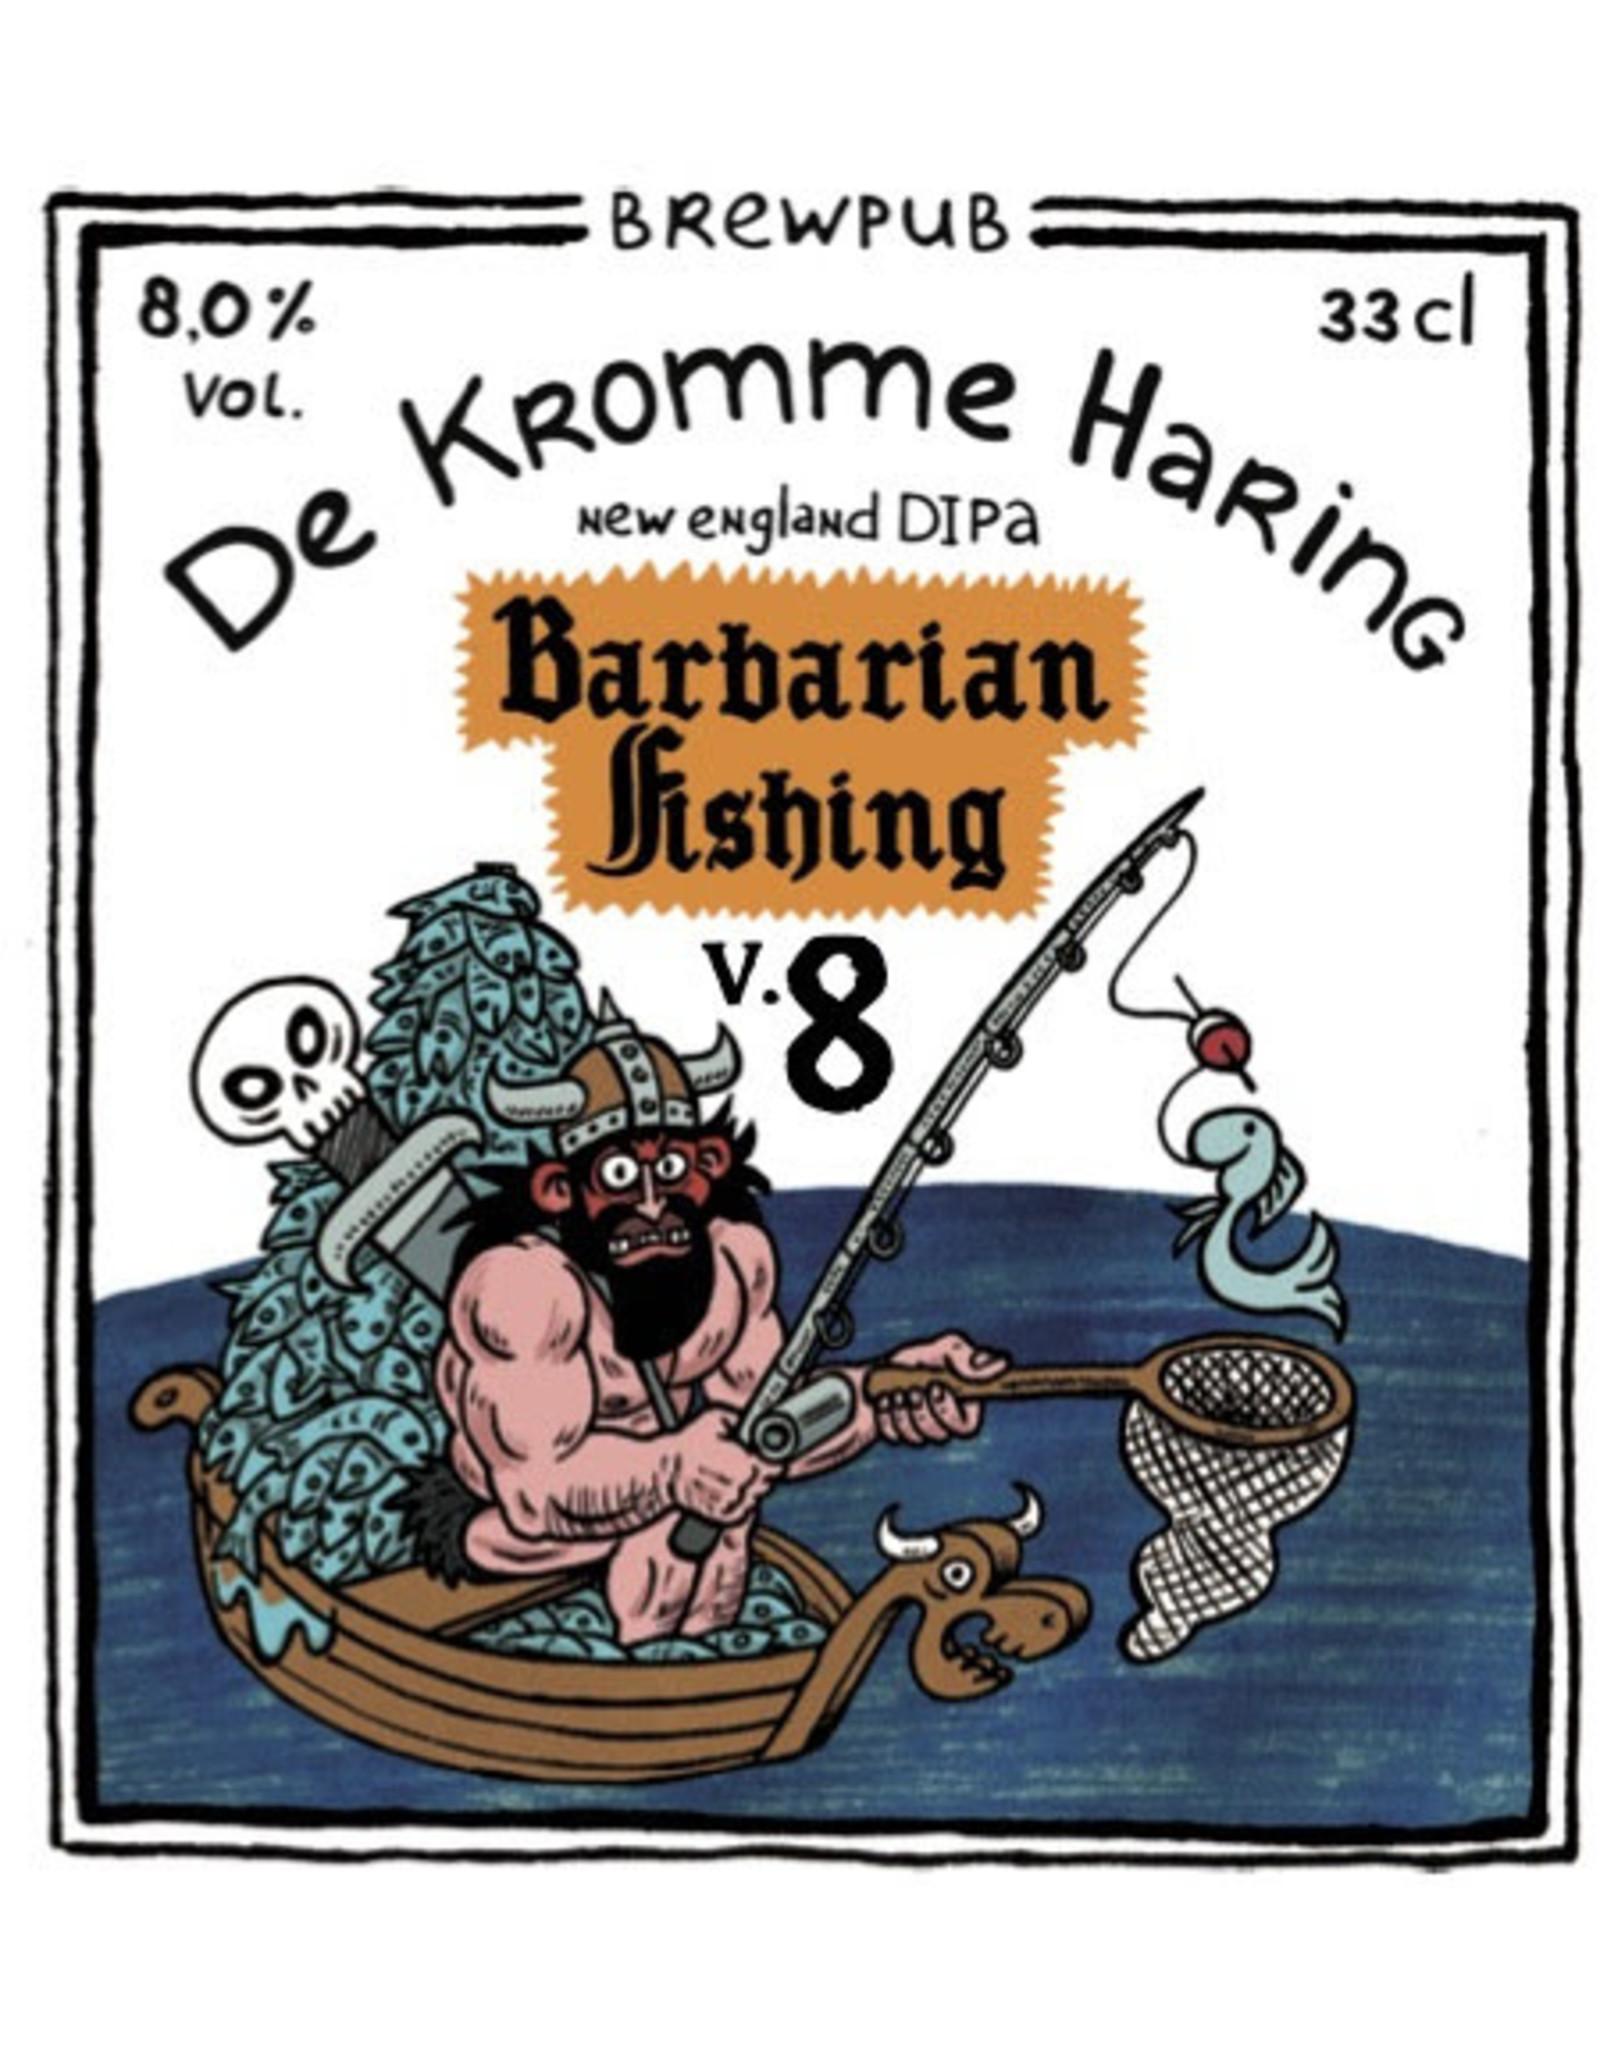 kromme haring Kromme Haring: Barbarian Fishing V8